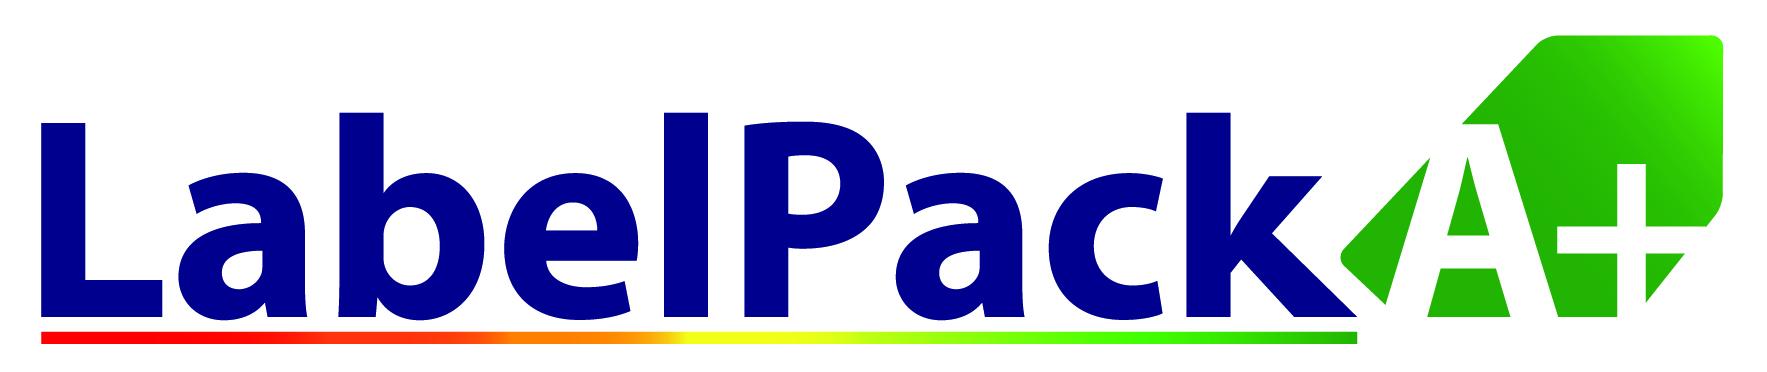 labelpacka_rgb